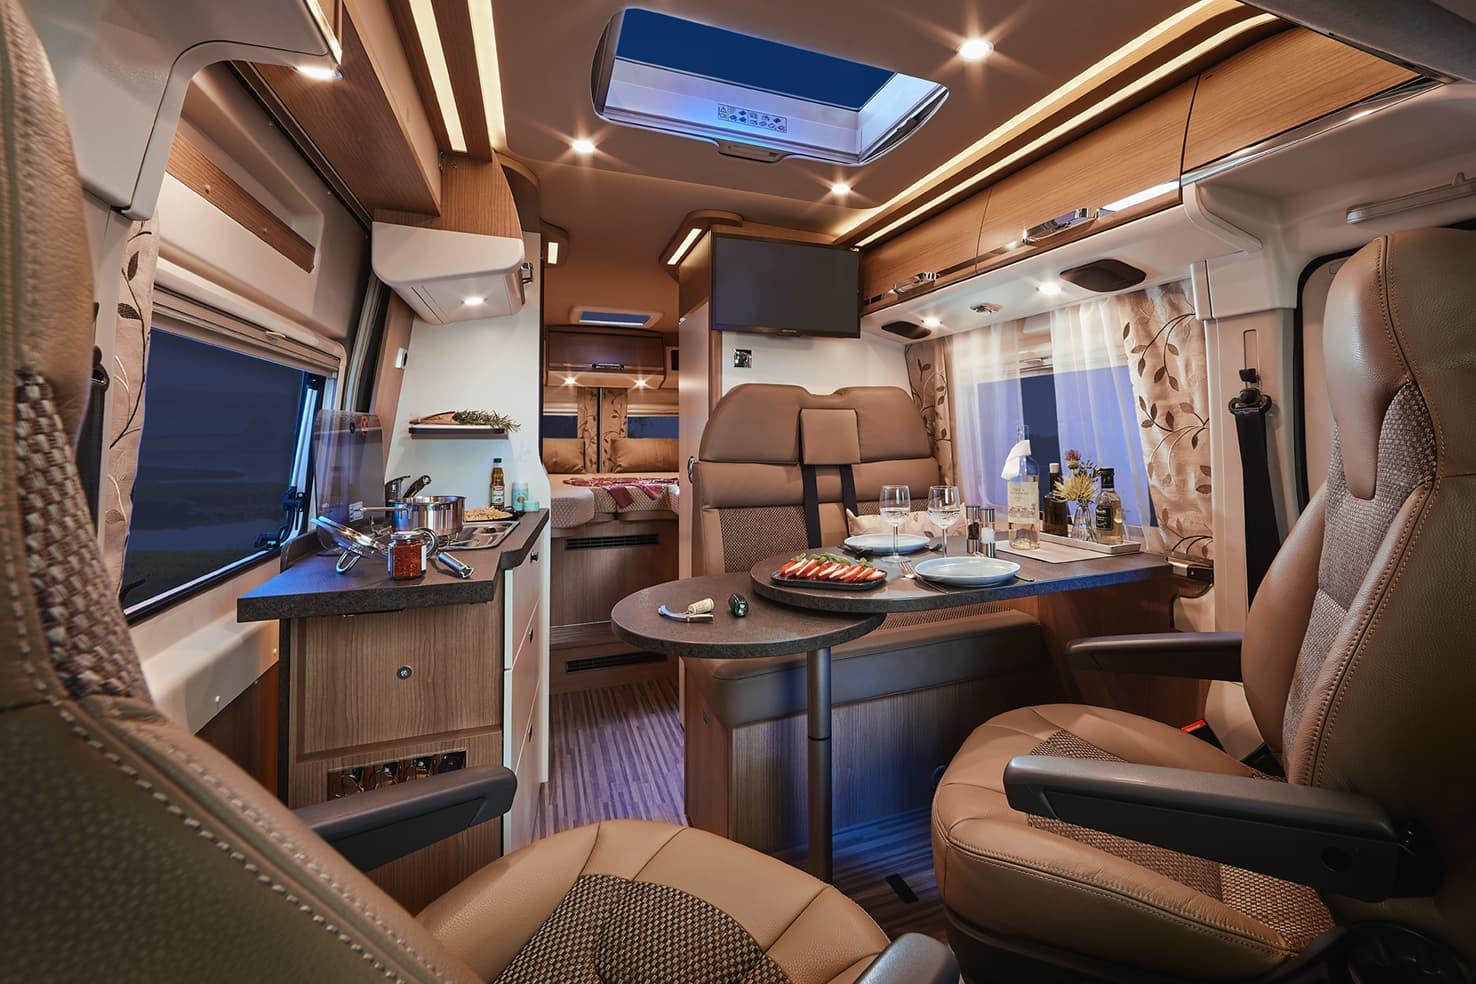 Hirschbühl Caravan Rental Malibu Van 640 GT Charming LE innen am Abend